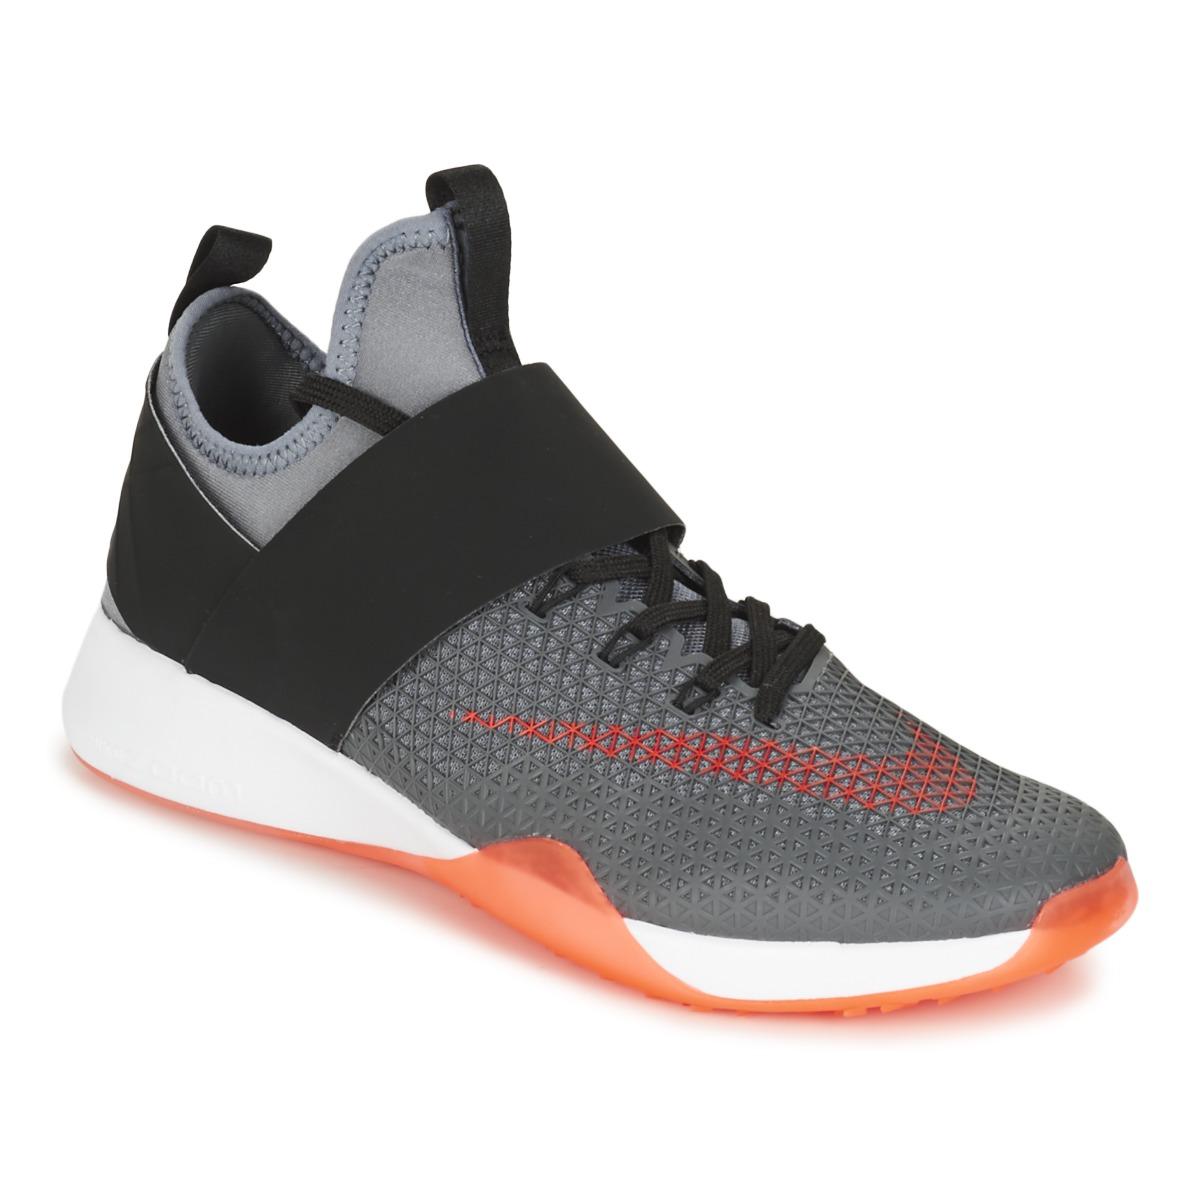 Nike AIR ZOOM STRONG W Grau / Schwarz - Kostenloser Versand bei Spartoode ! - Schuhe Fitnessschuhe Damen 71,40 €